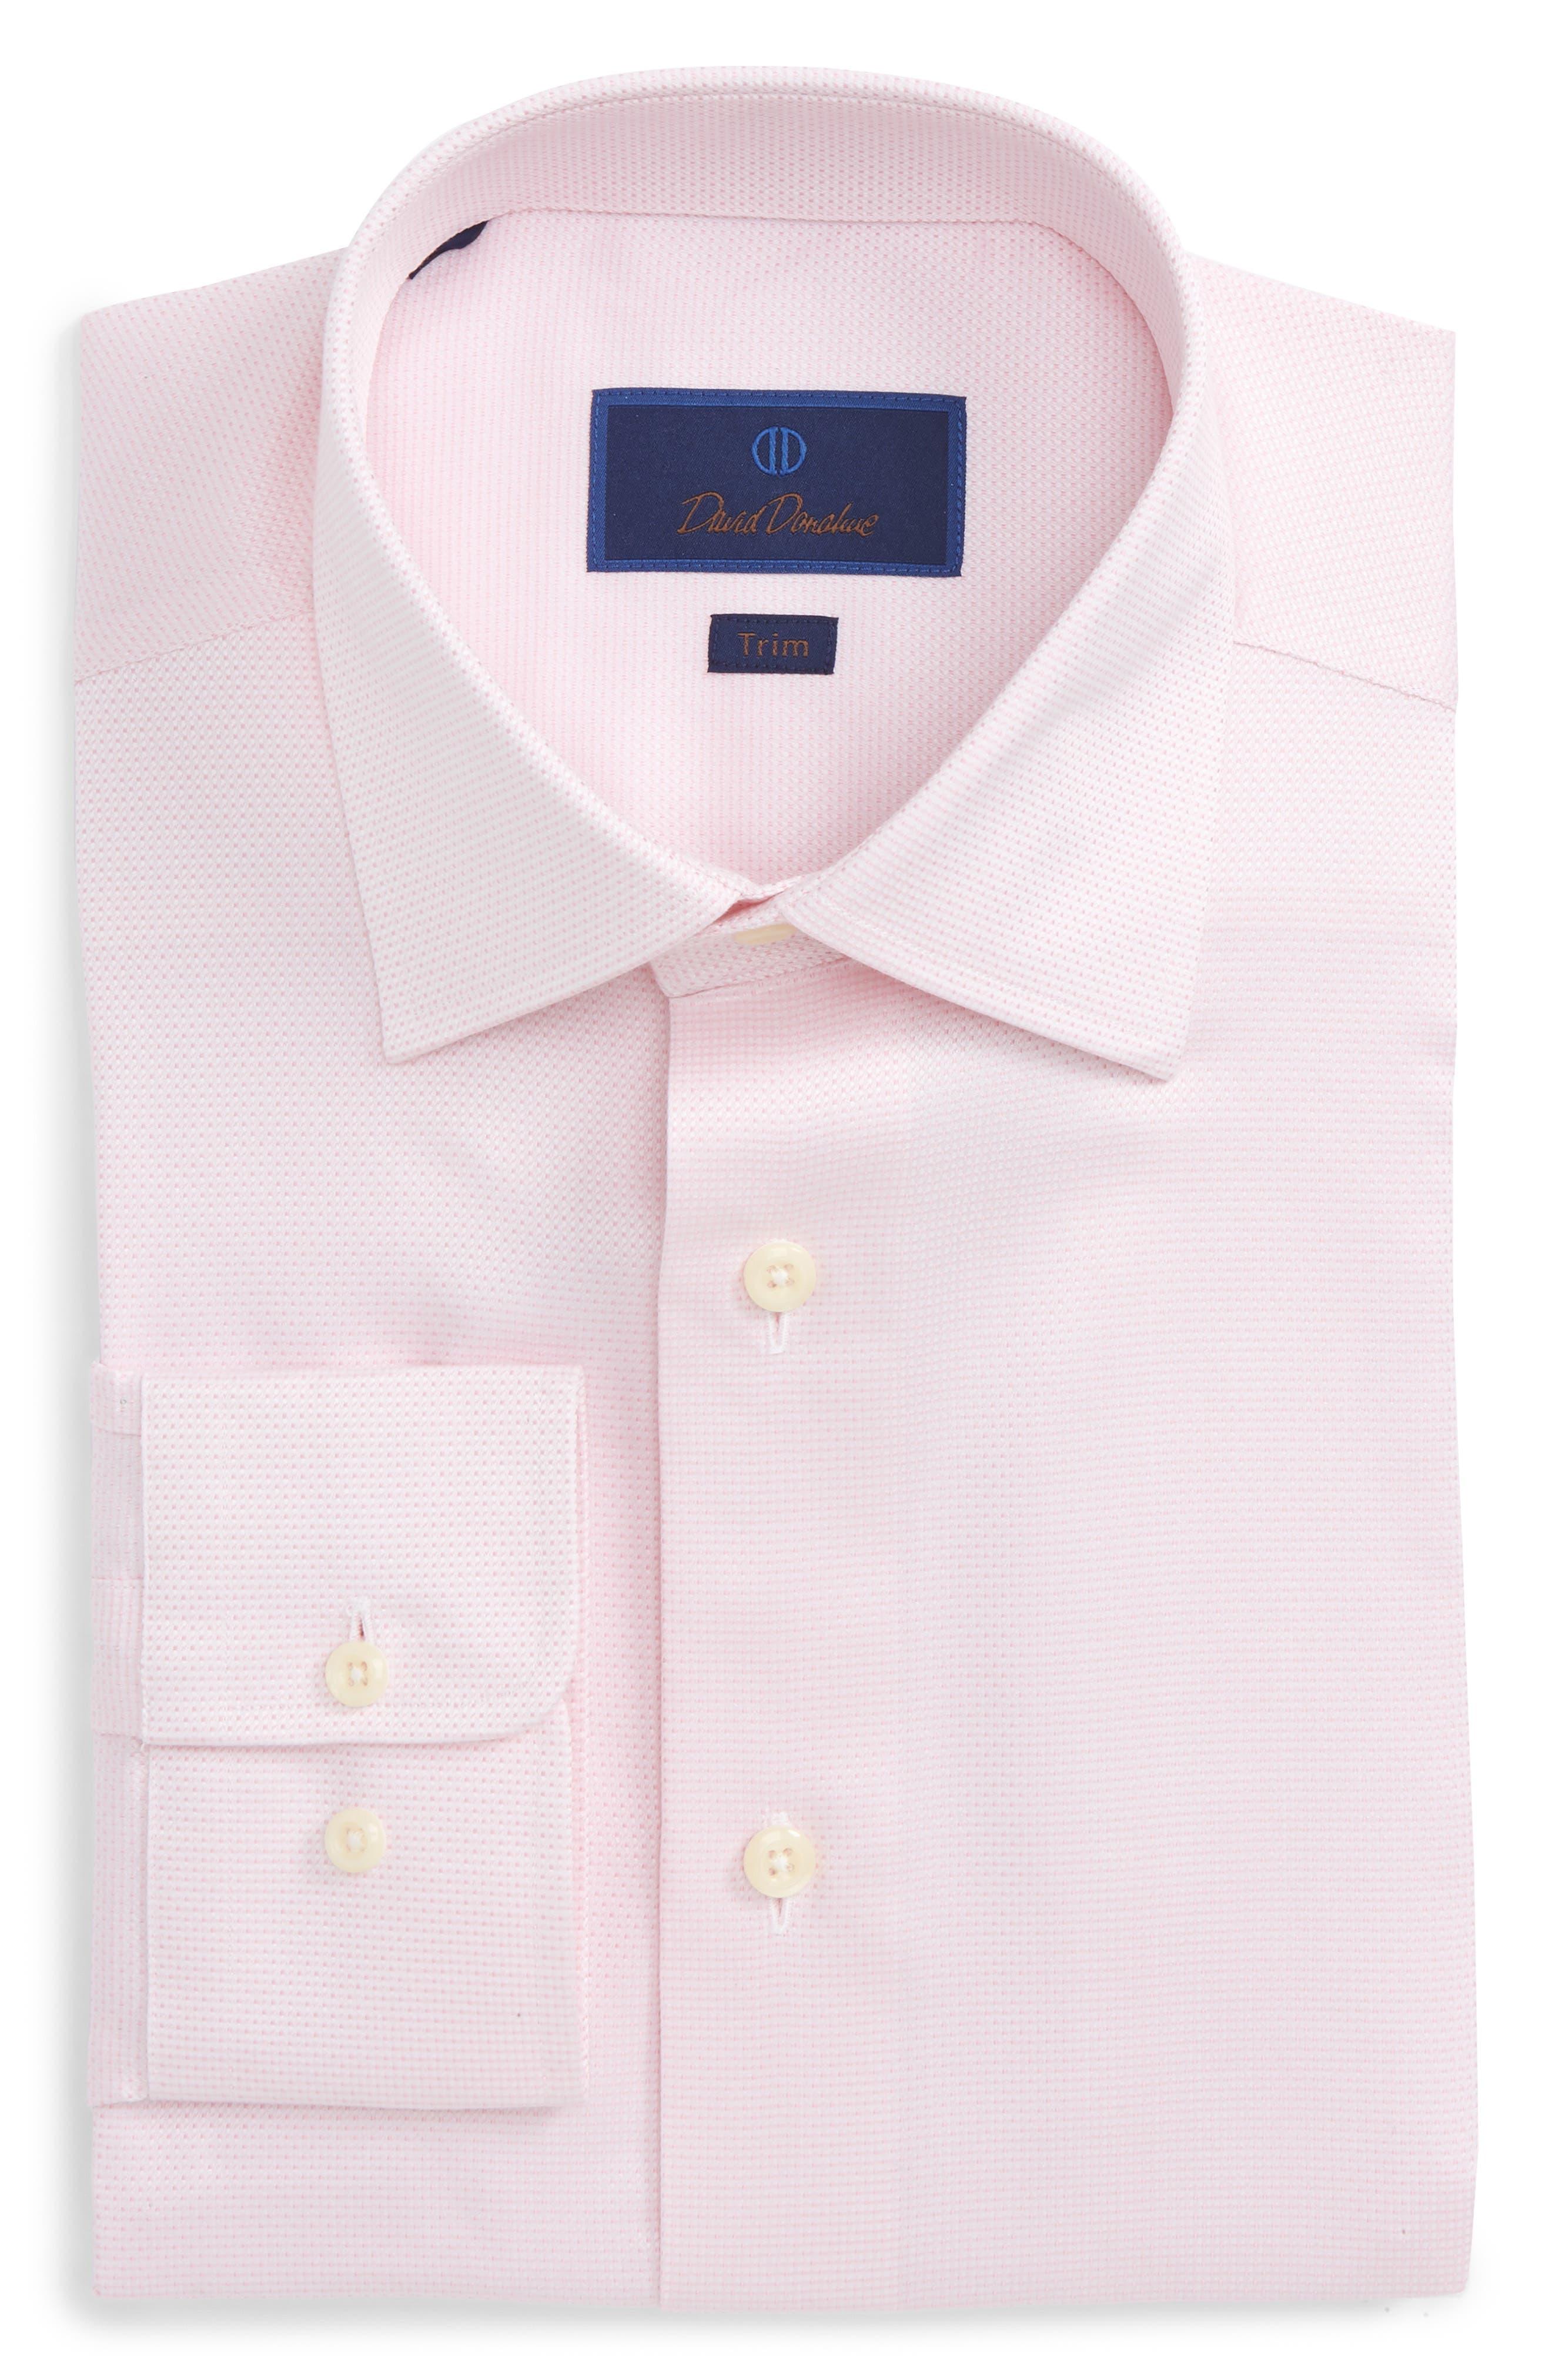 Main Image - David Donahue Trim Fit Microdot Dress Shirt